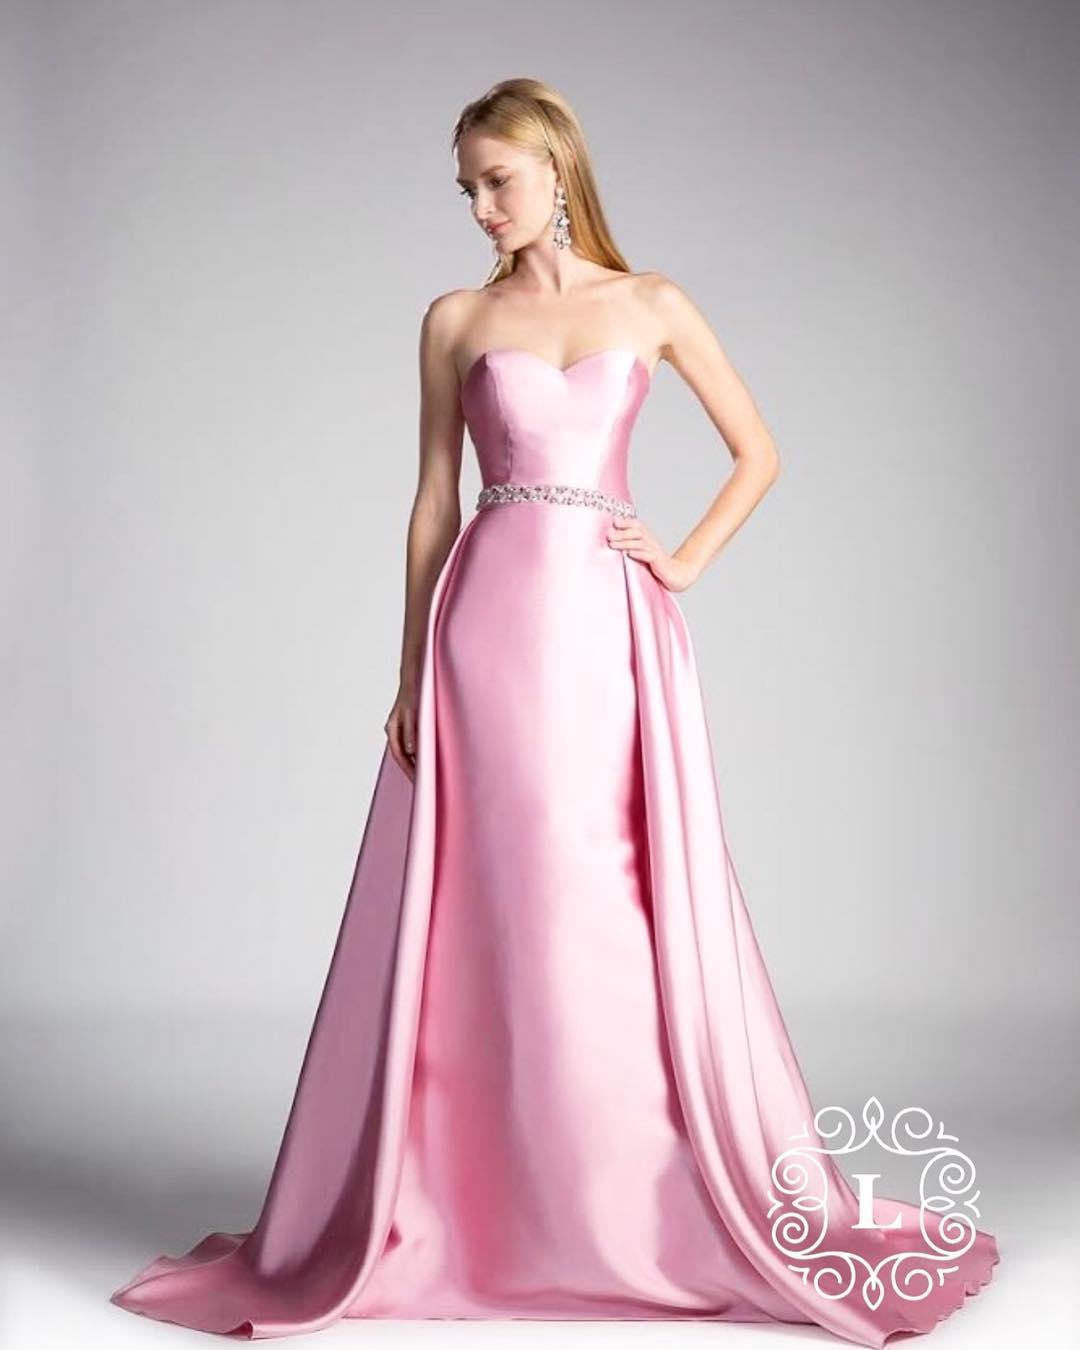 vestidos de graduacion | Beauty and fashion ideas Fashion Trends ...